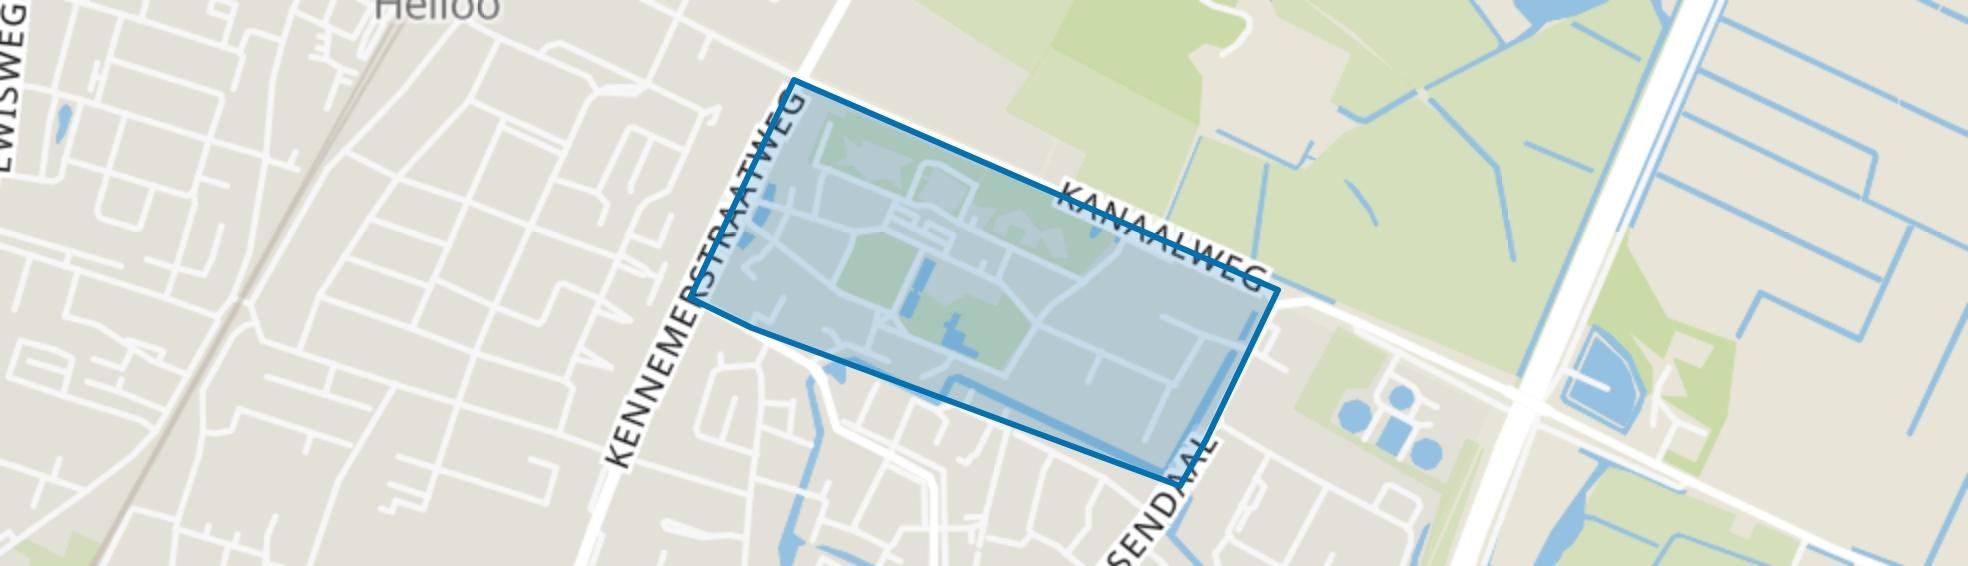 Willibrord, Heiloo map